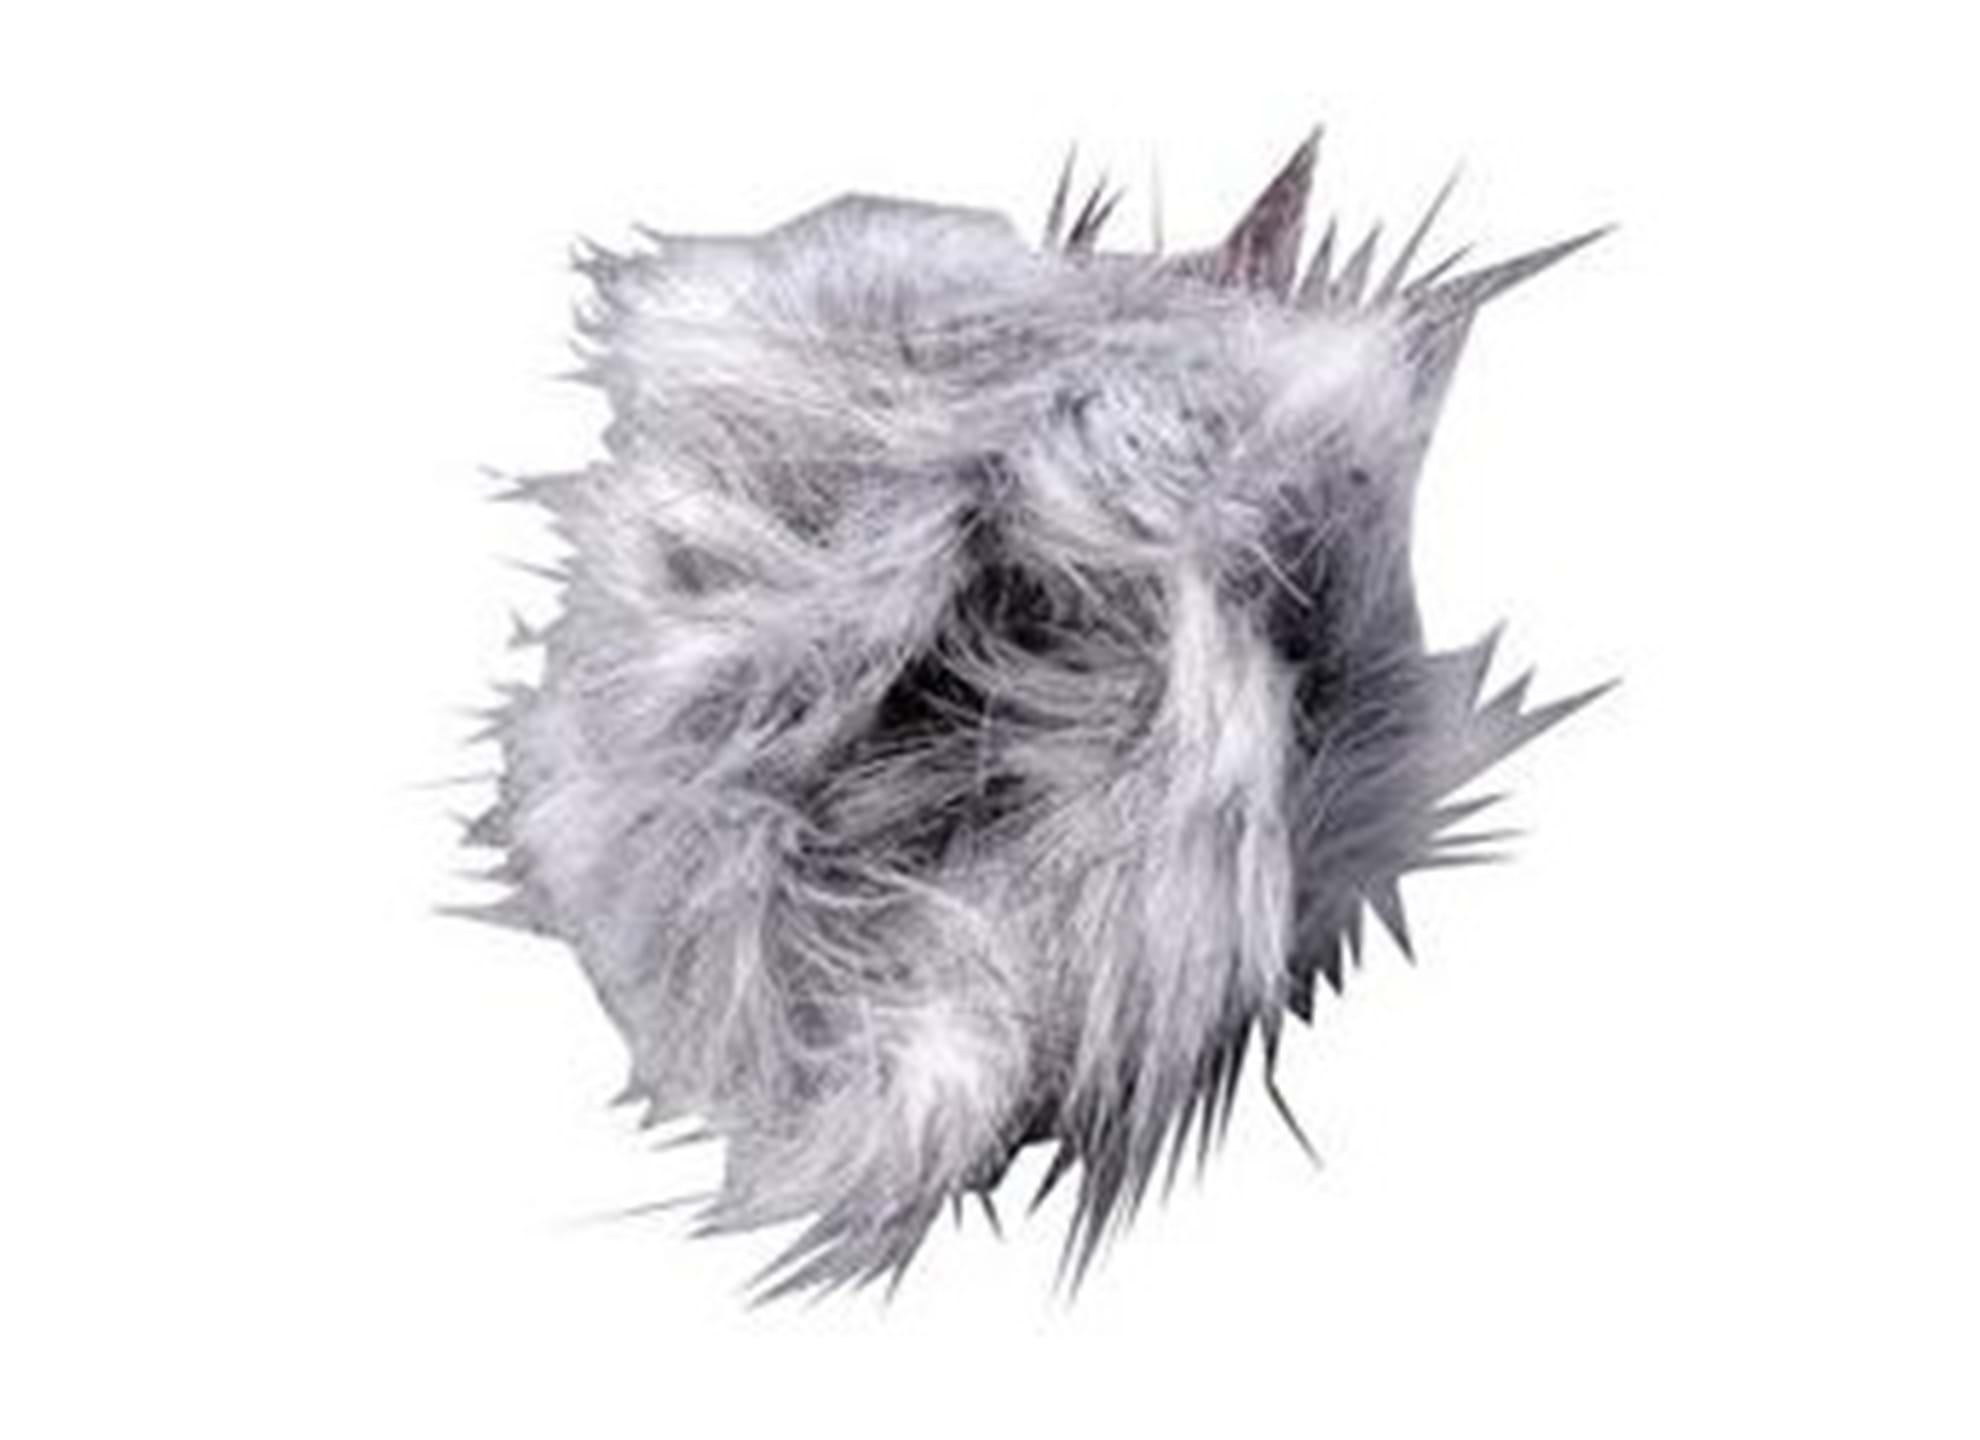 Dead Kitten/vindskydd